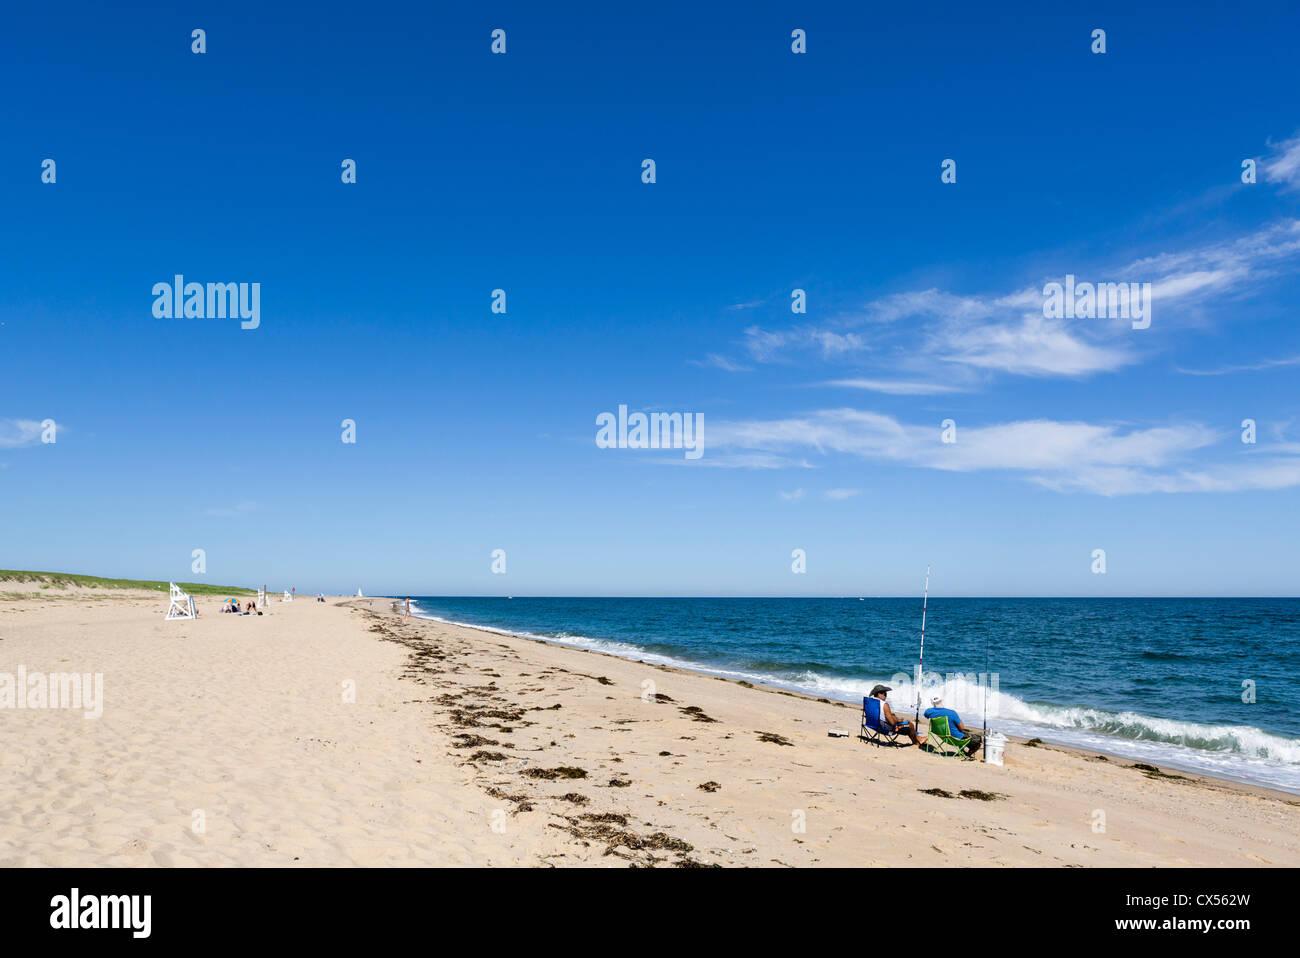 Race Point Beach, Cape Cod National Seashore, Cape Cod, Massachusetts, USA - Stock Image